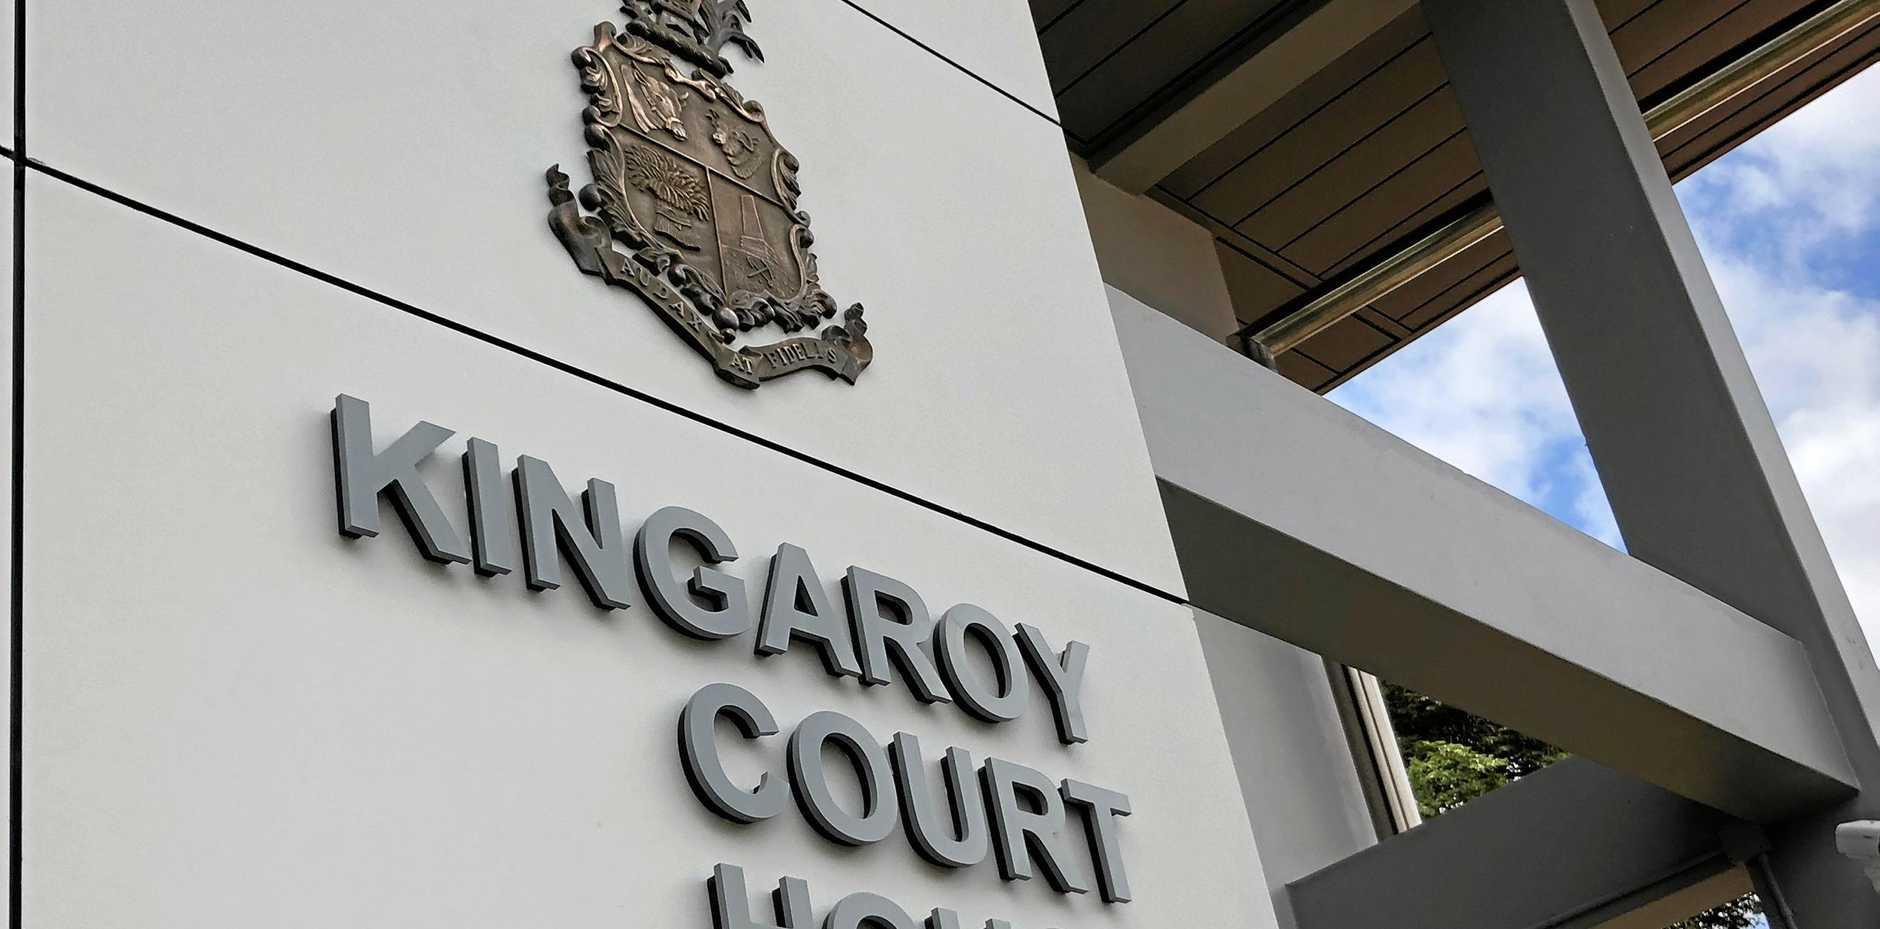 Kingaroy Court.